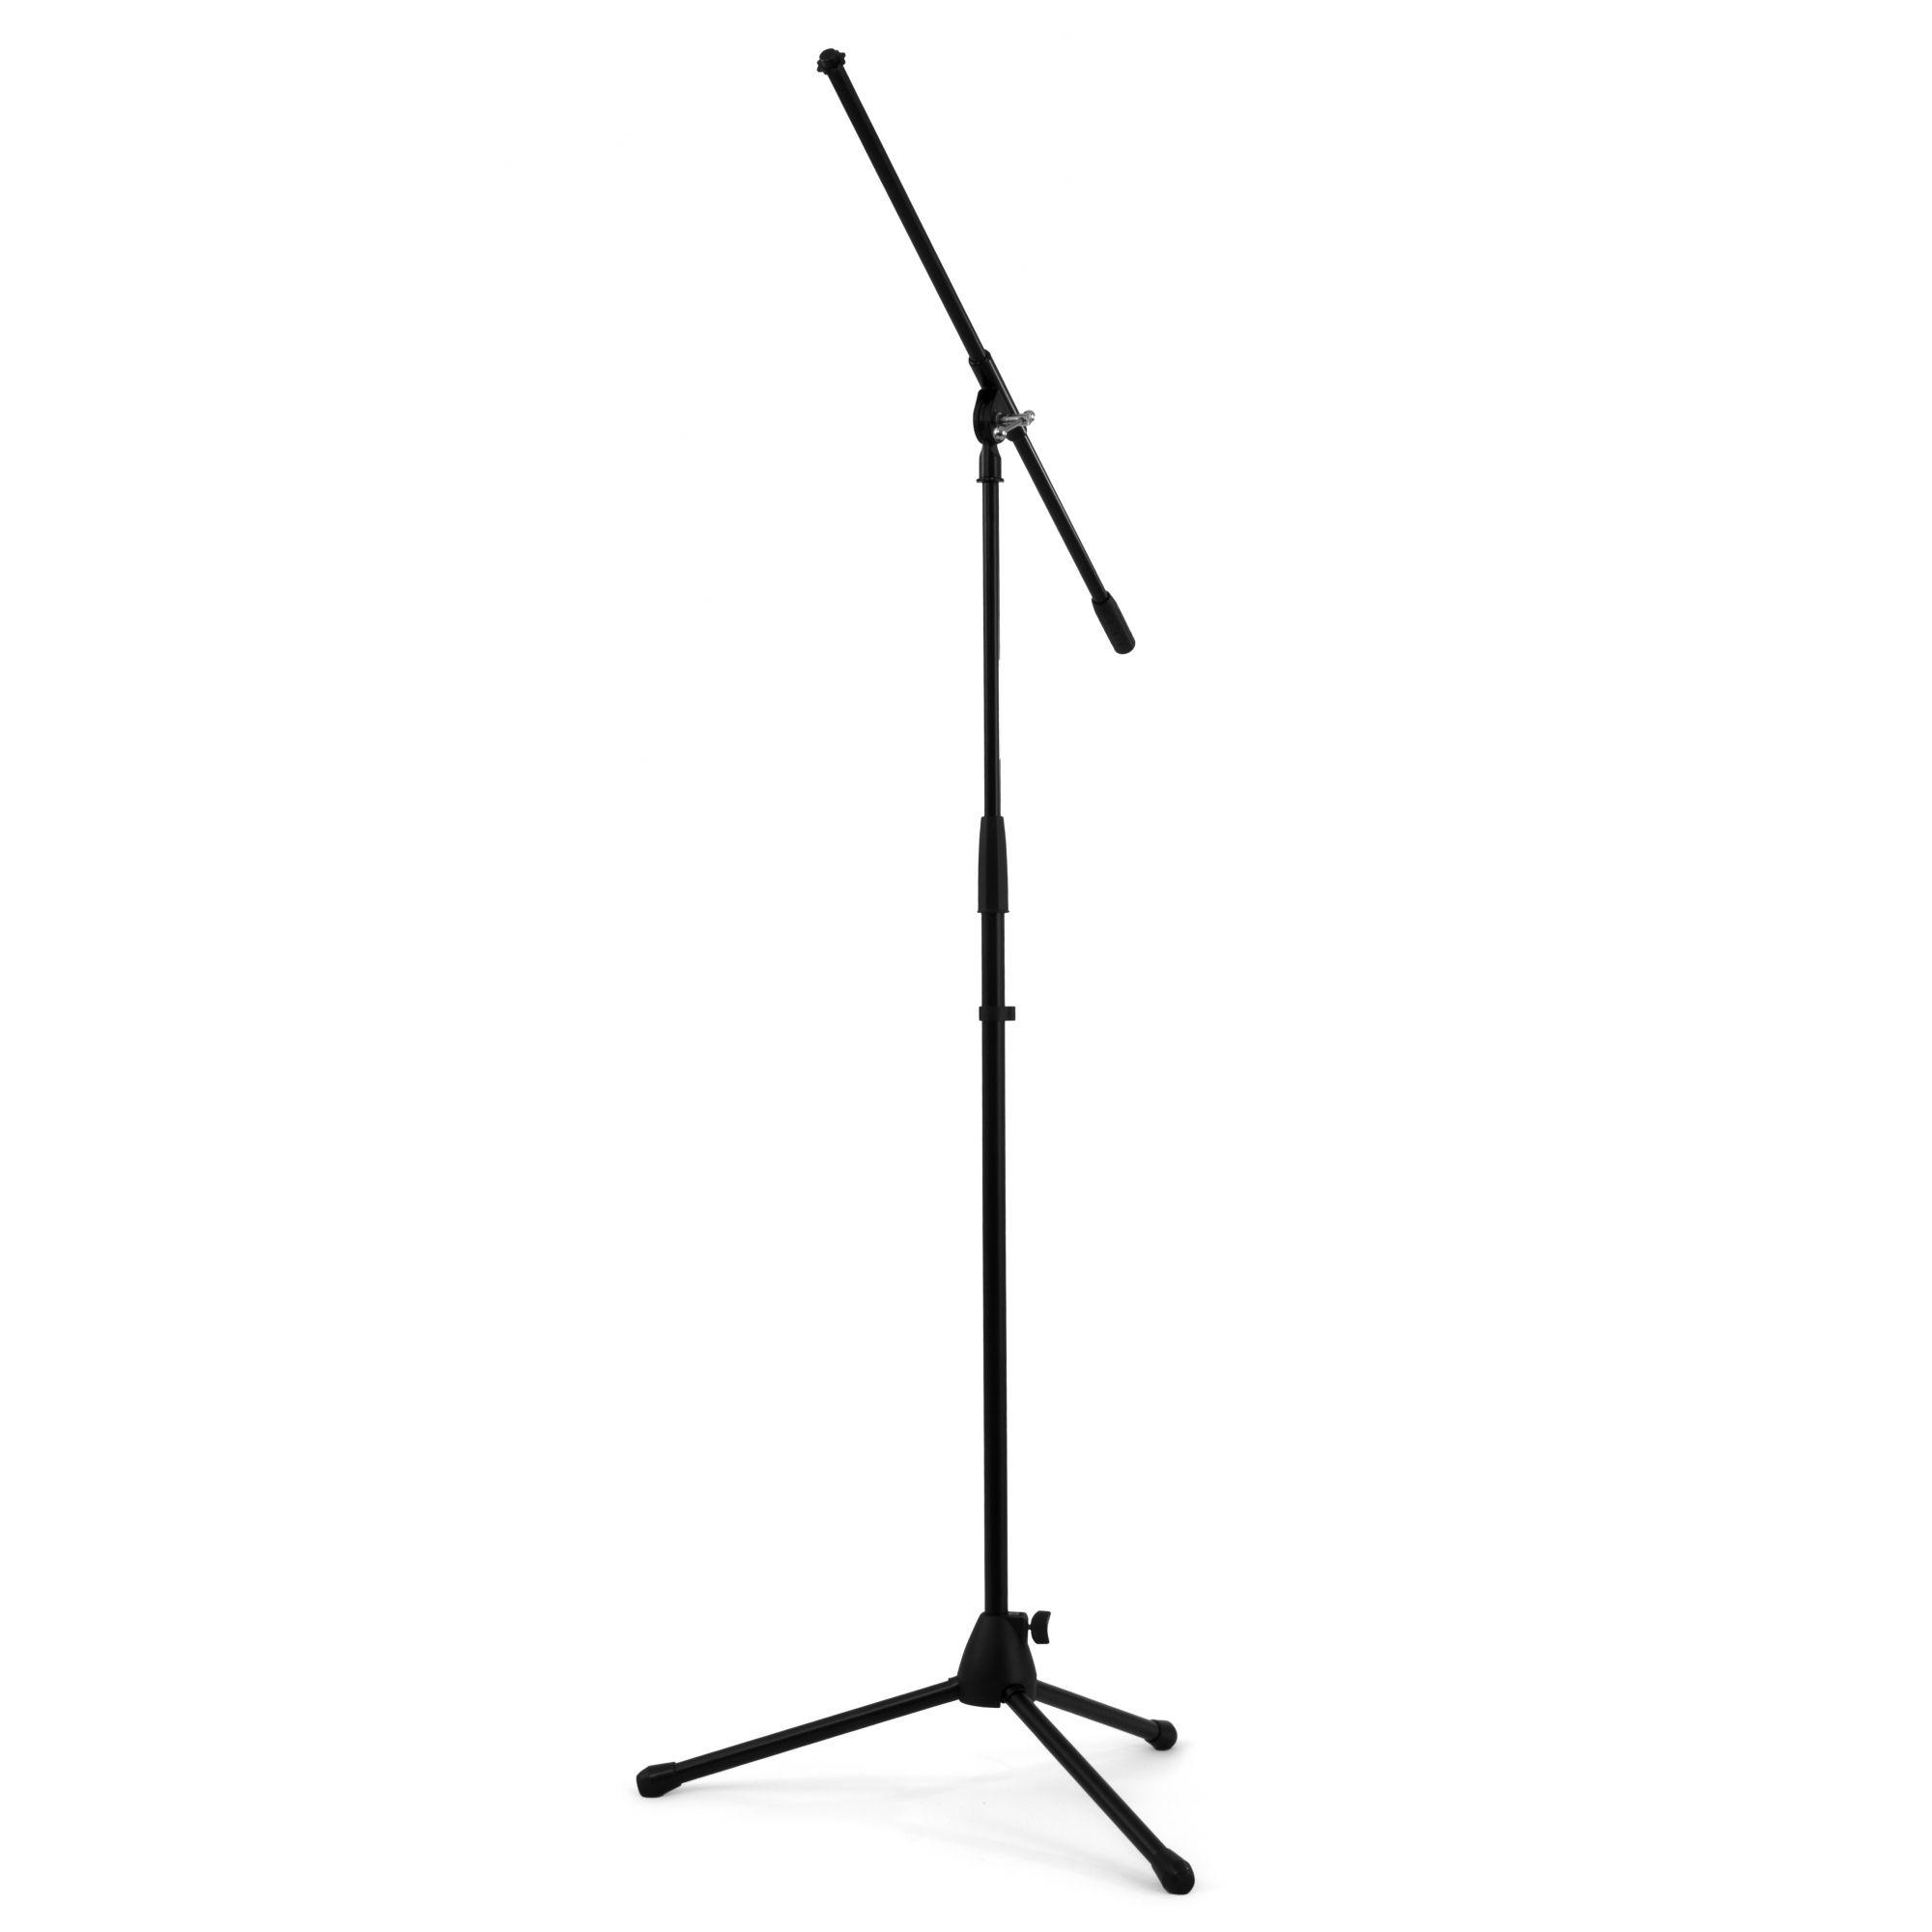 Pedestal Girafa para Microfone com Base Tripé Nomad By Hercules.